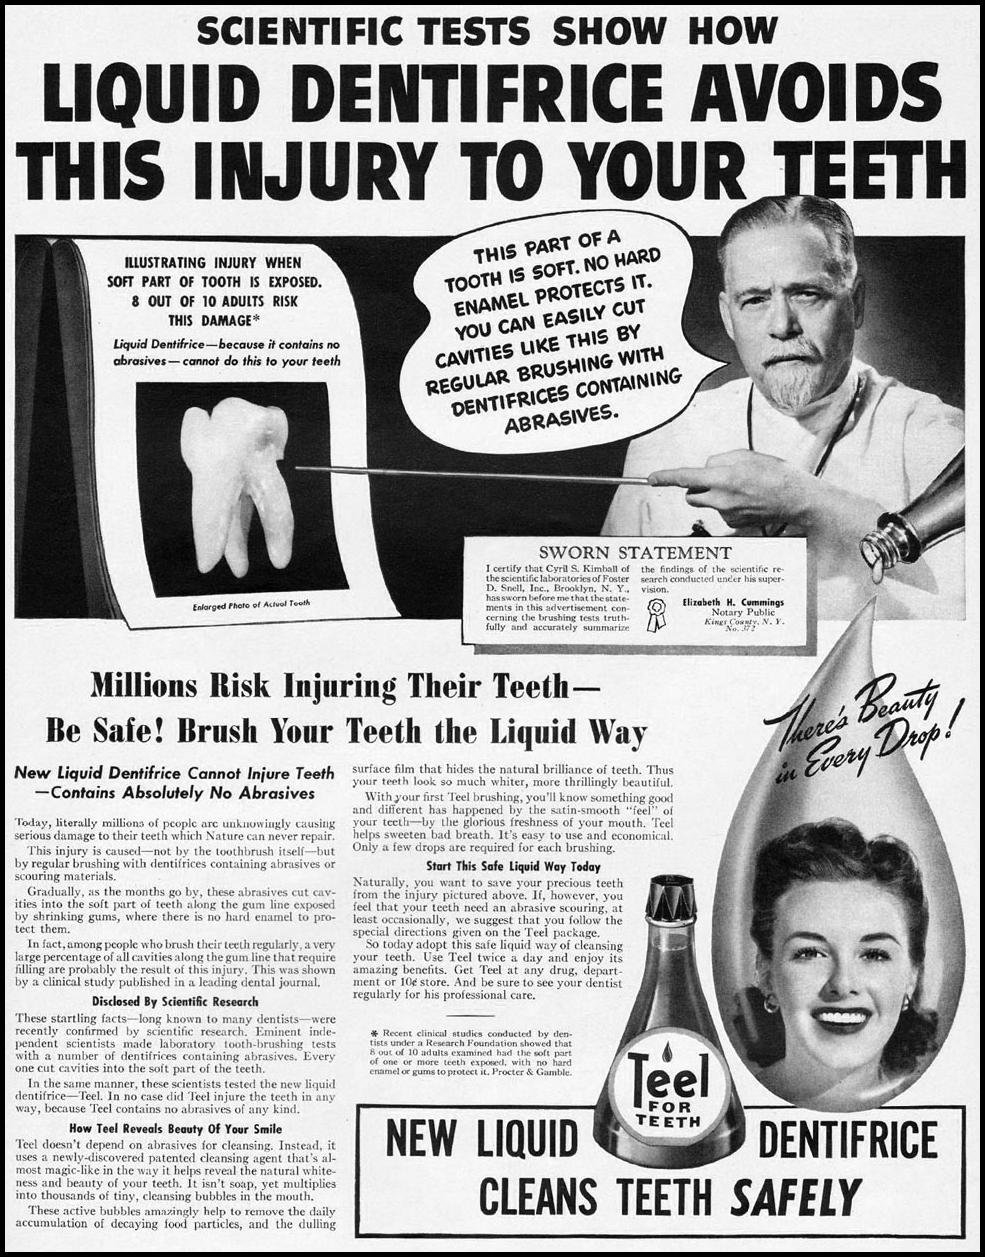 TEEL LIQUID DENTIFRICE LIFE 08/04/1941 p. 62